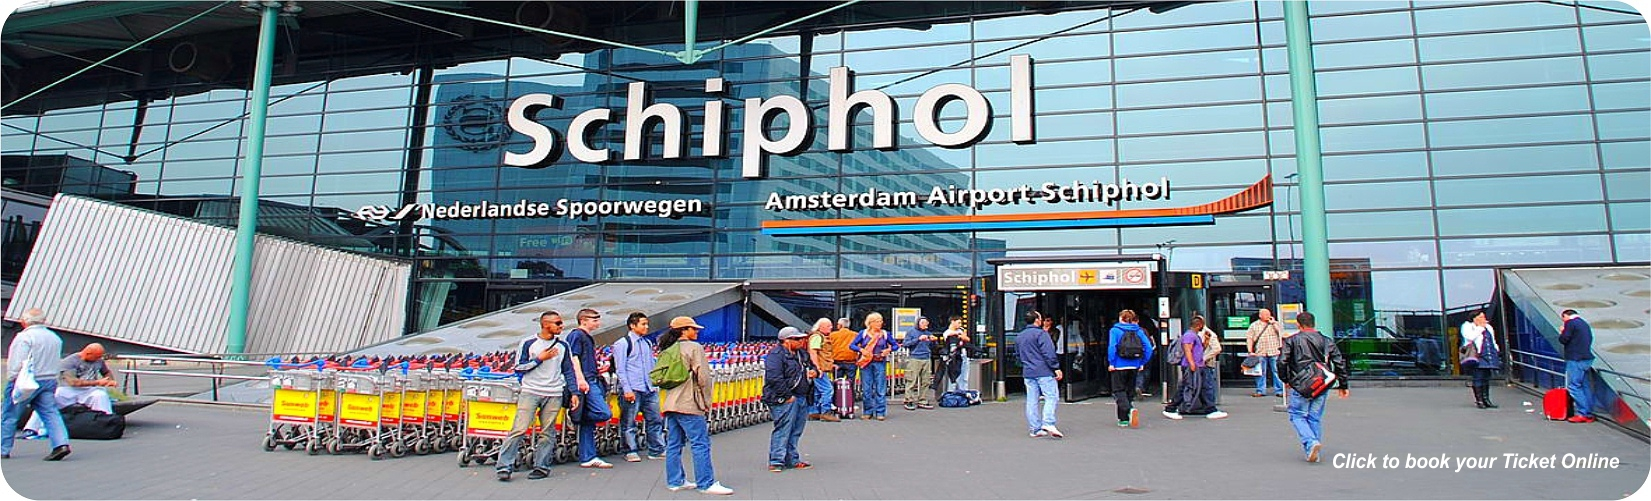 Amsterdam-airport.